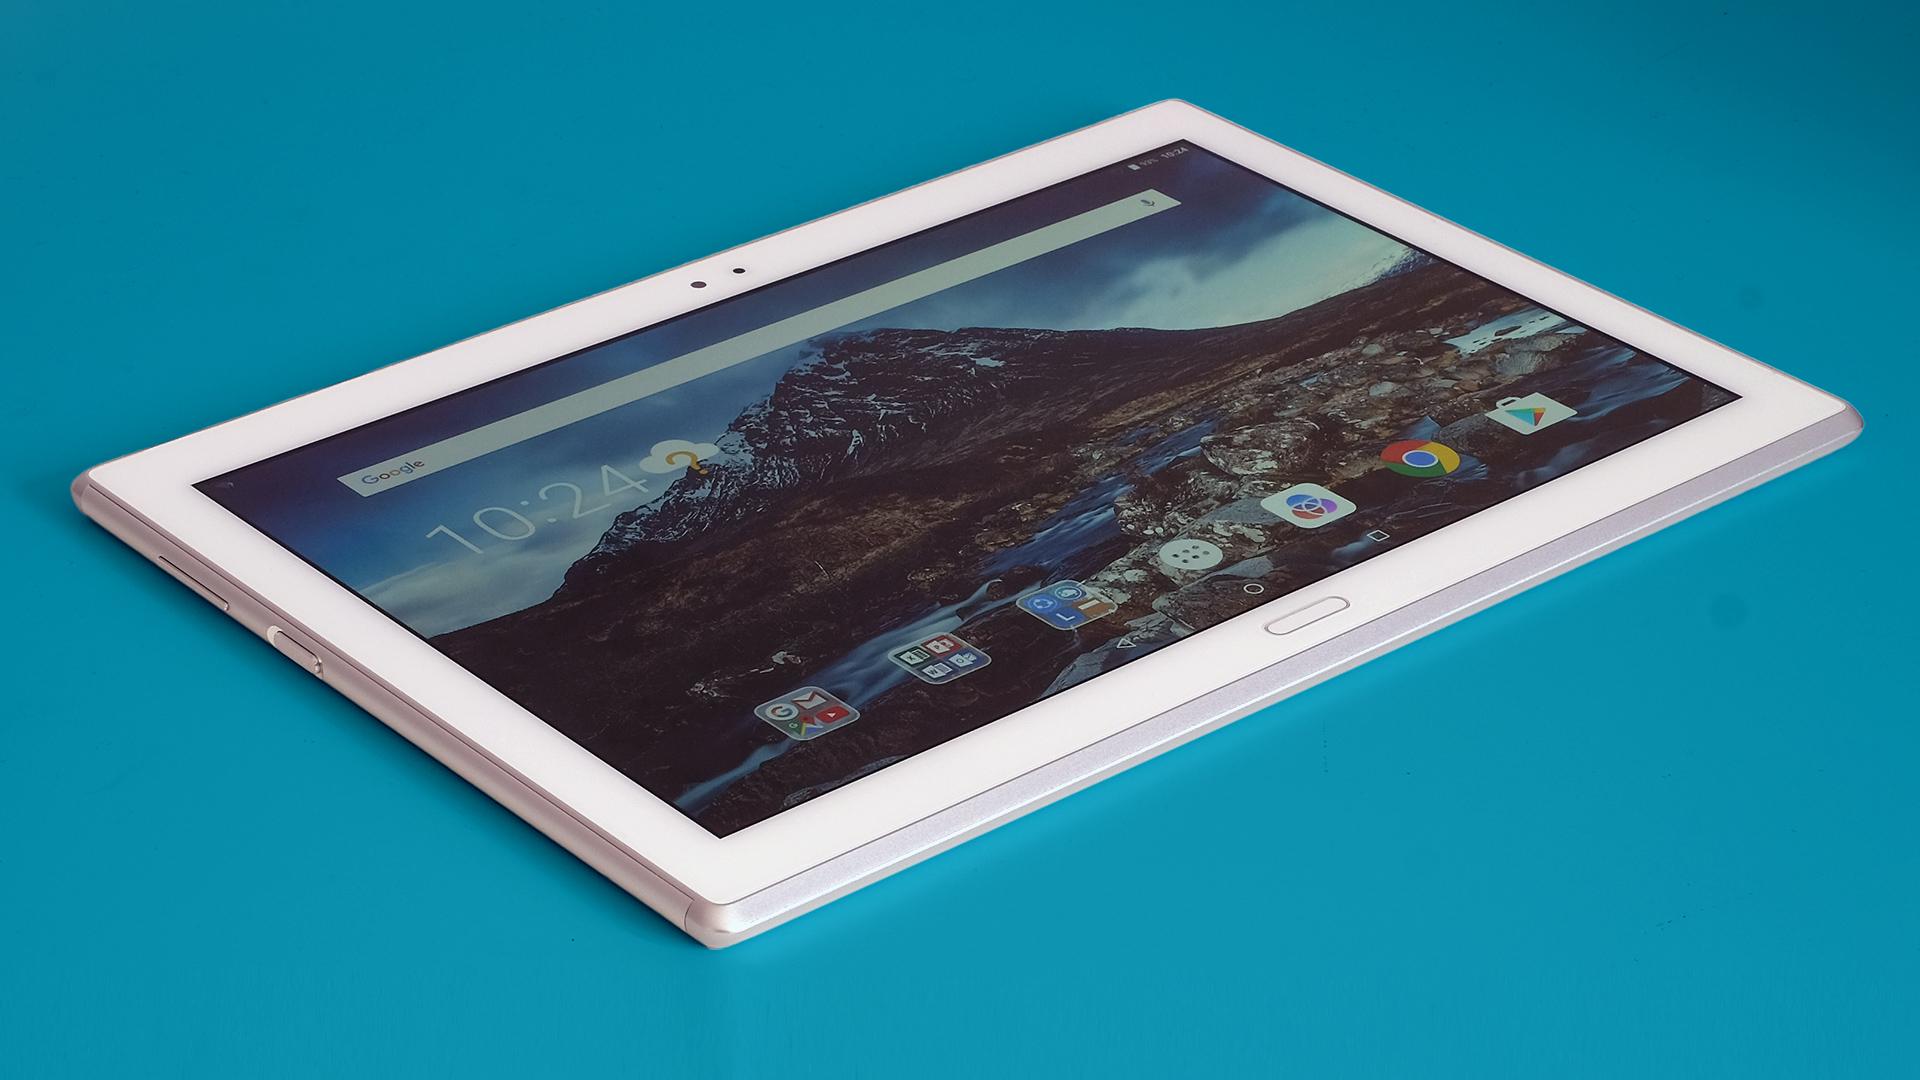 Lenovo Tab 4 10 Plus review | TechRadar